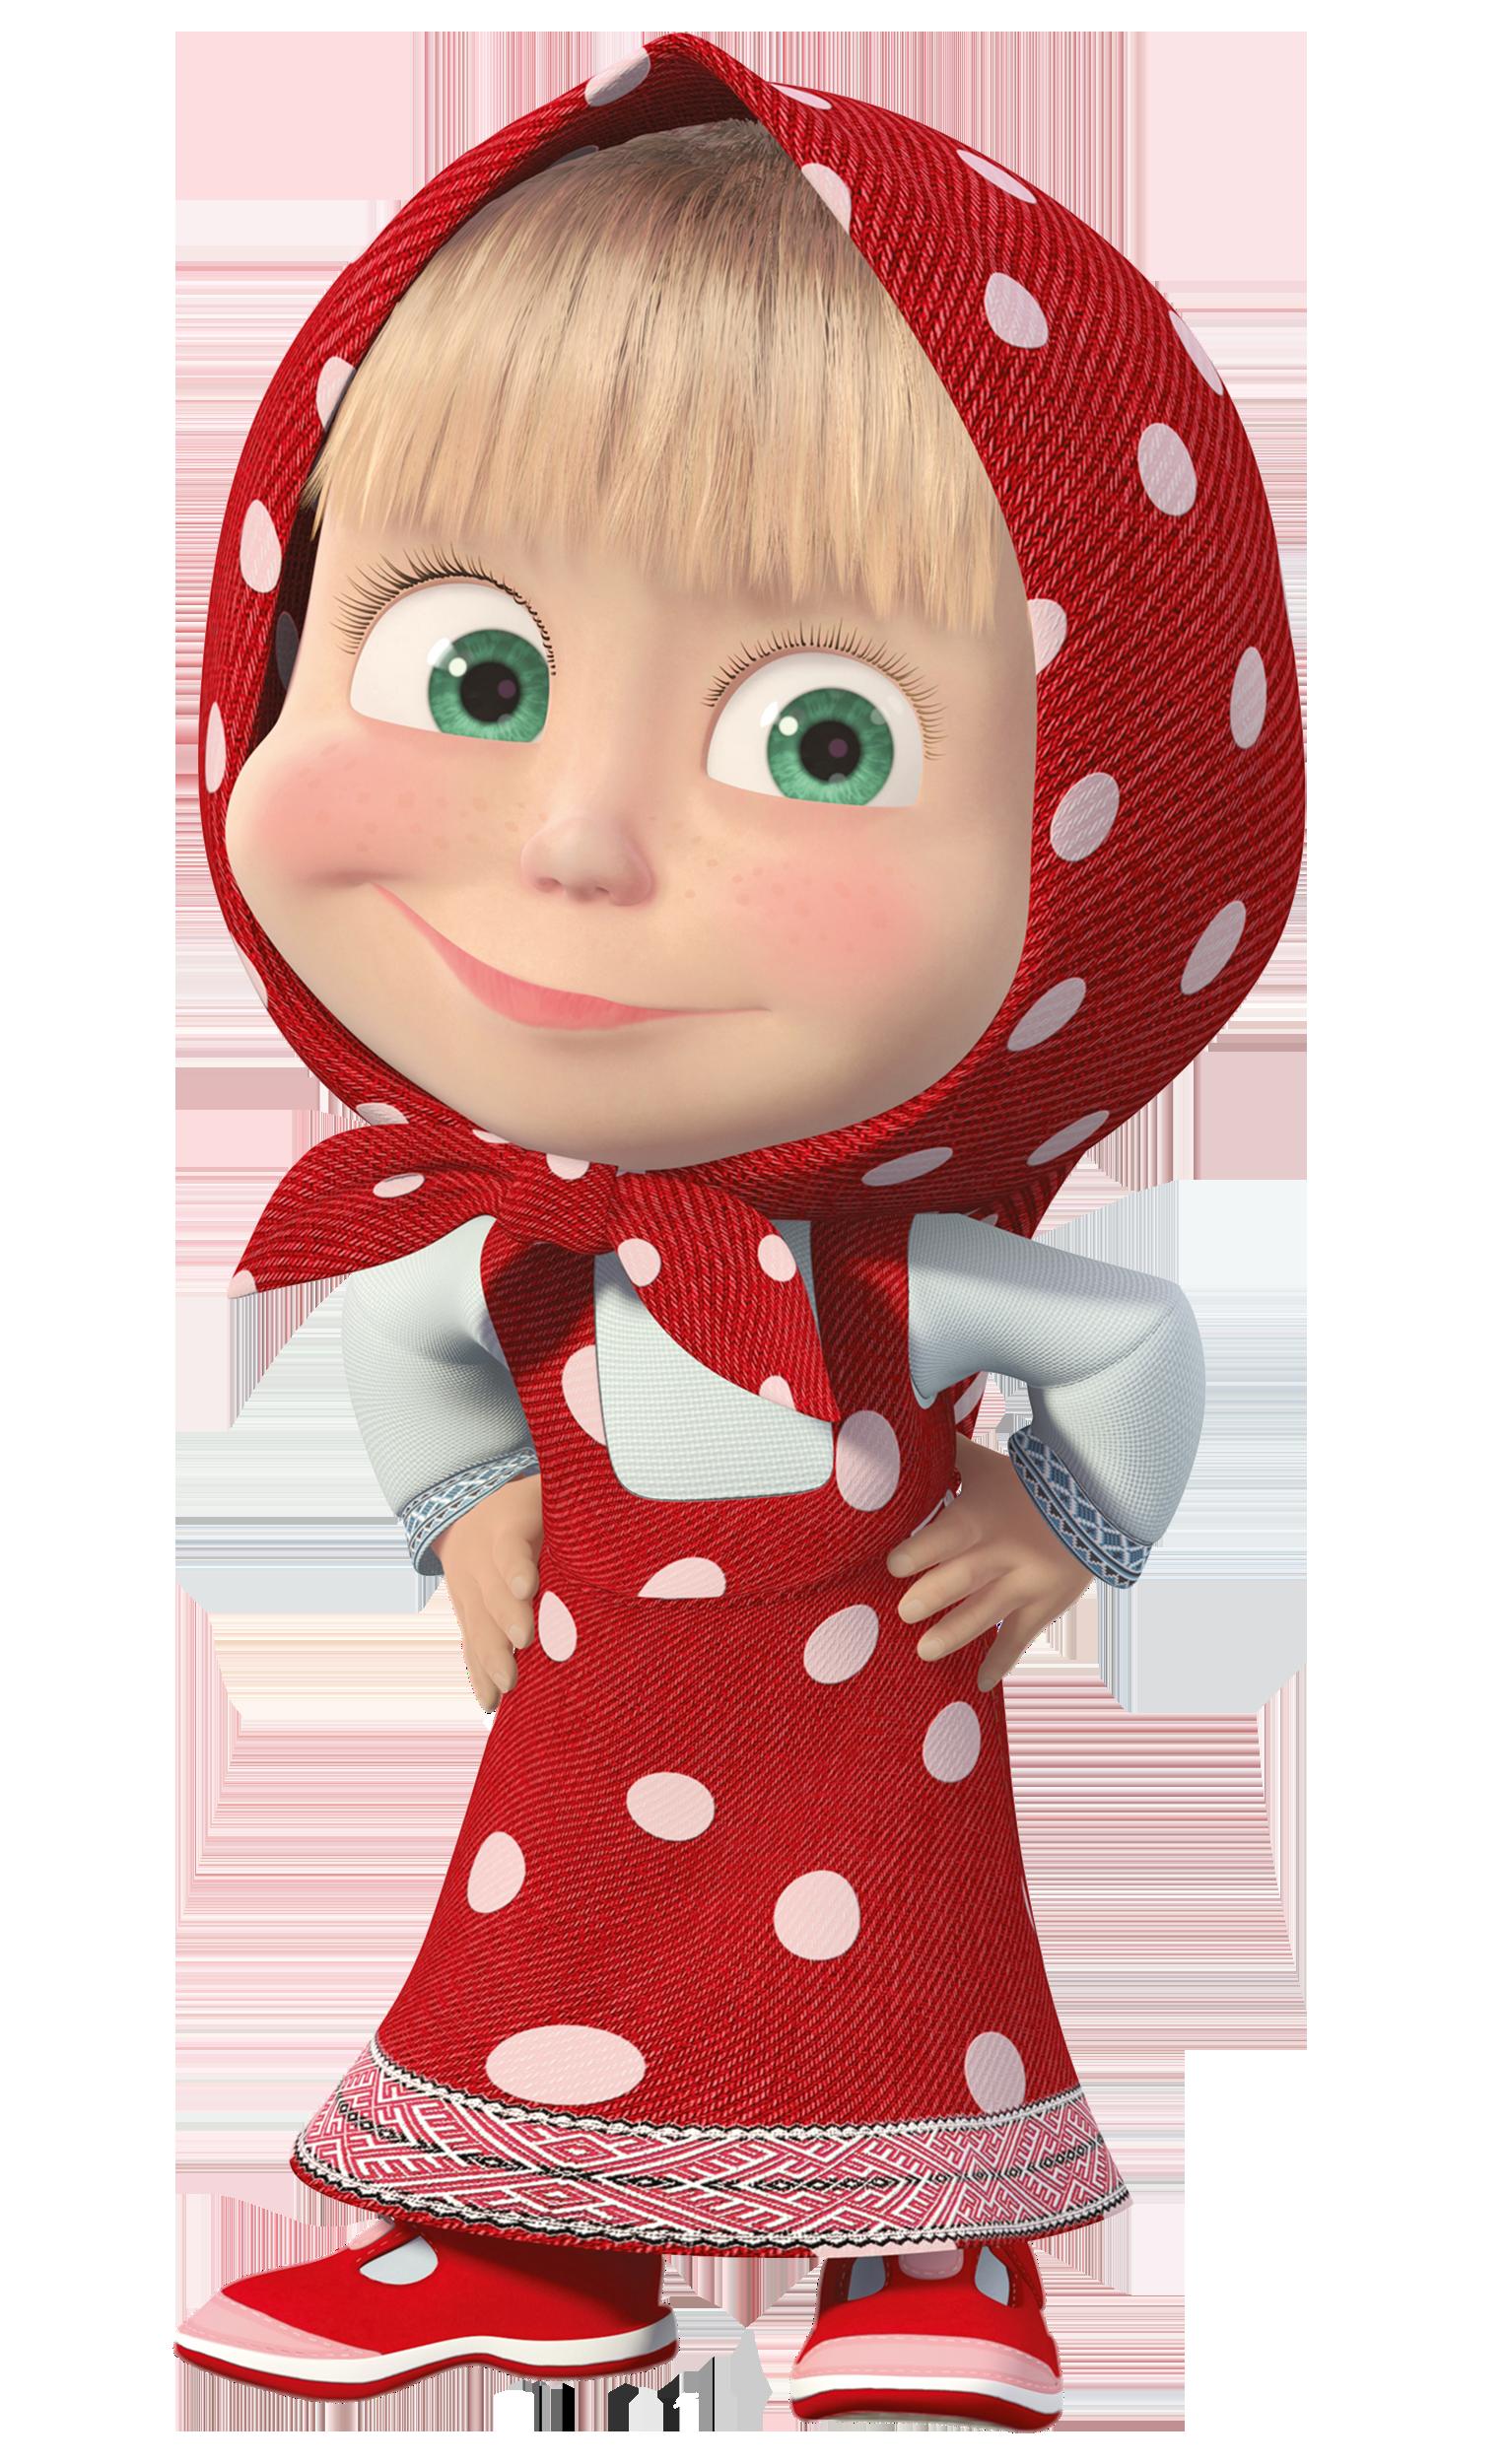 Masha with Red Dress Transparent PNG Clip Art Image